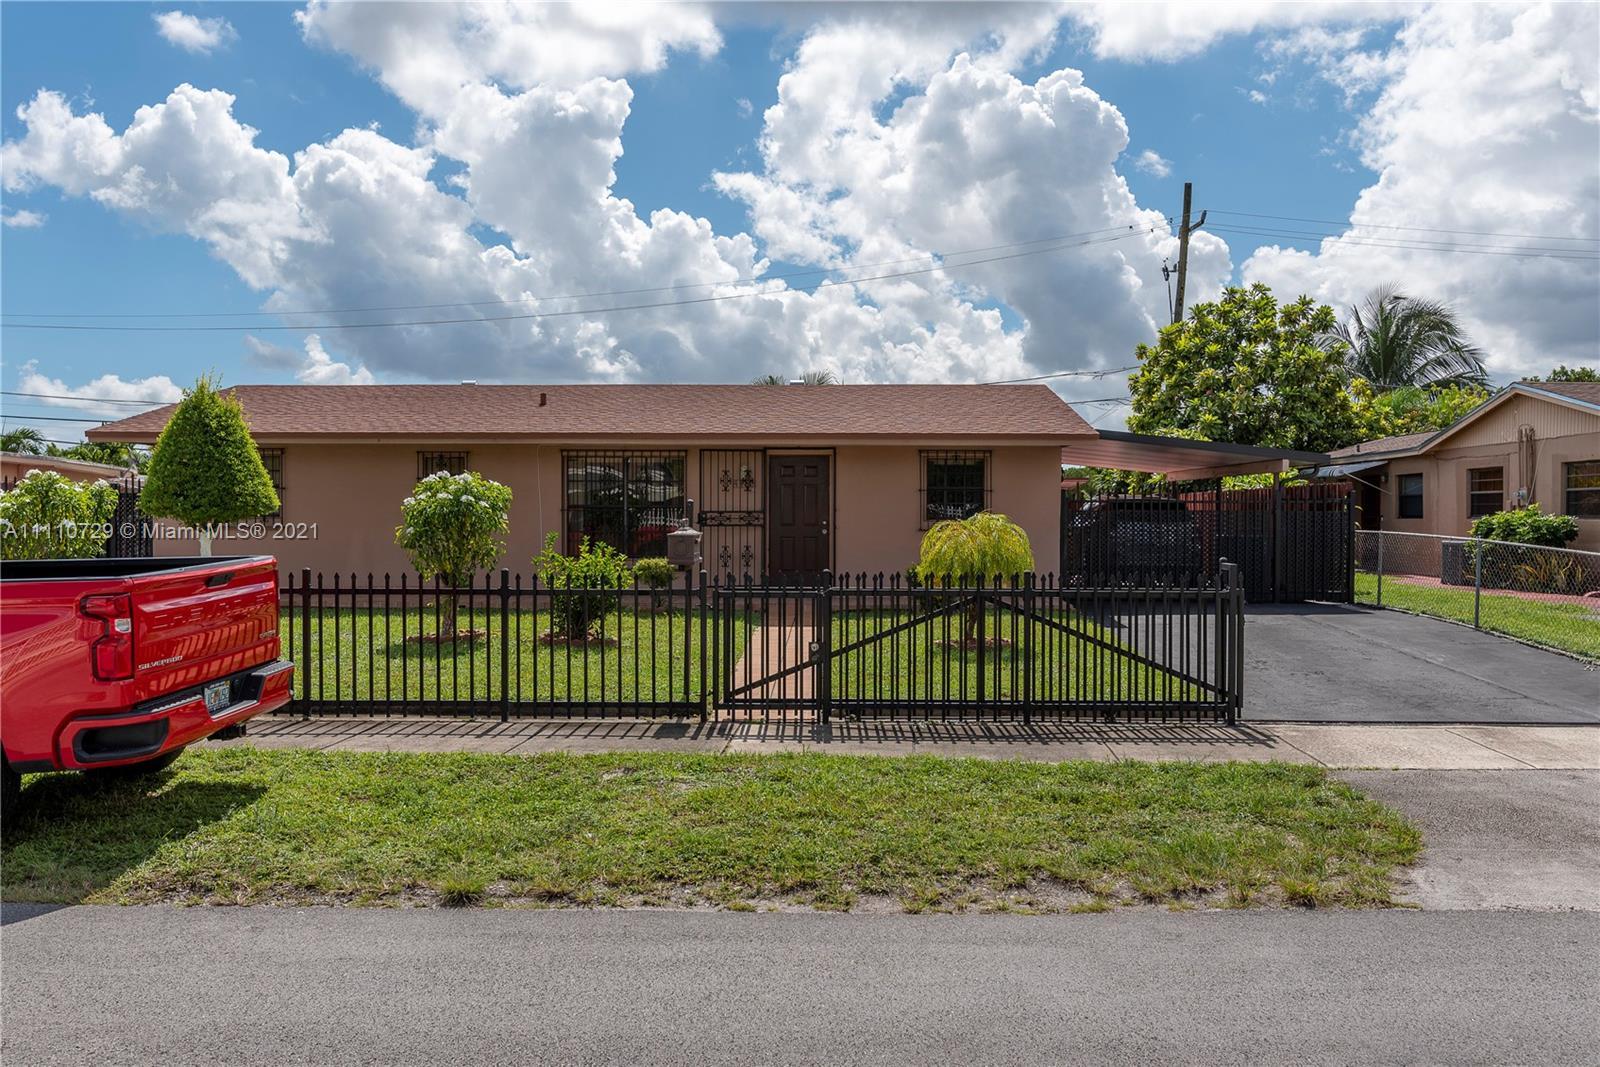 Single Family Home,For Sale,4480 NW 203rd Ter, Miami Gardens, Florida 33055,Brickell,realty,broker,condos near me